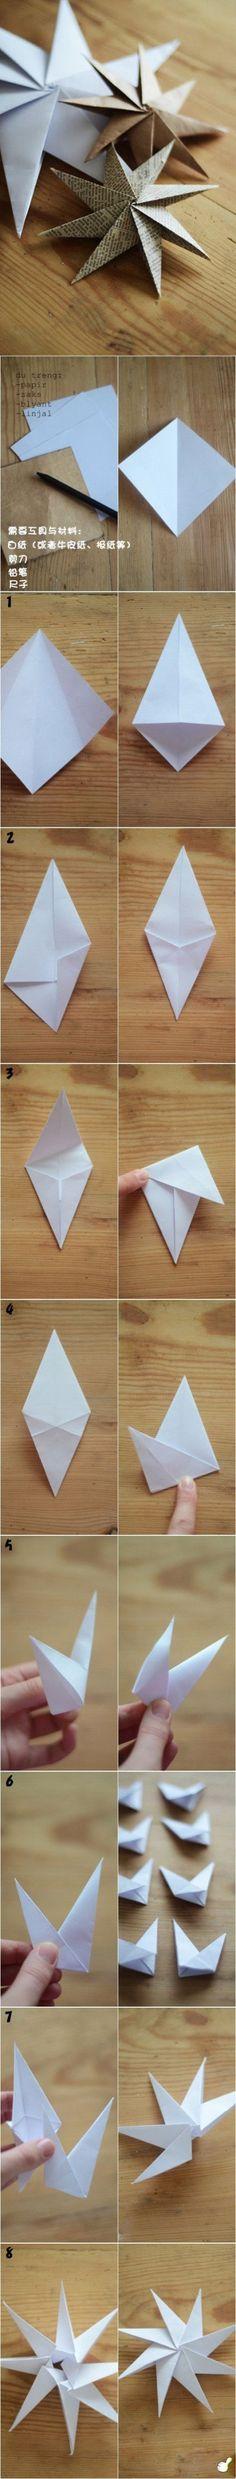 DIY Paper Stars: